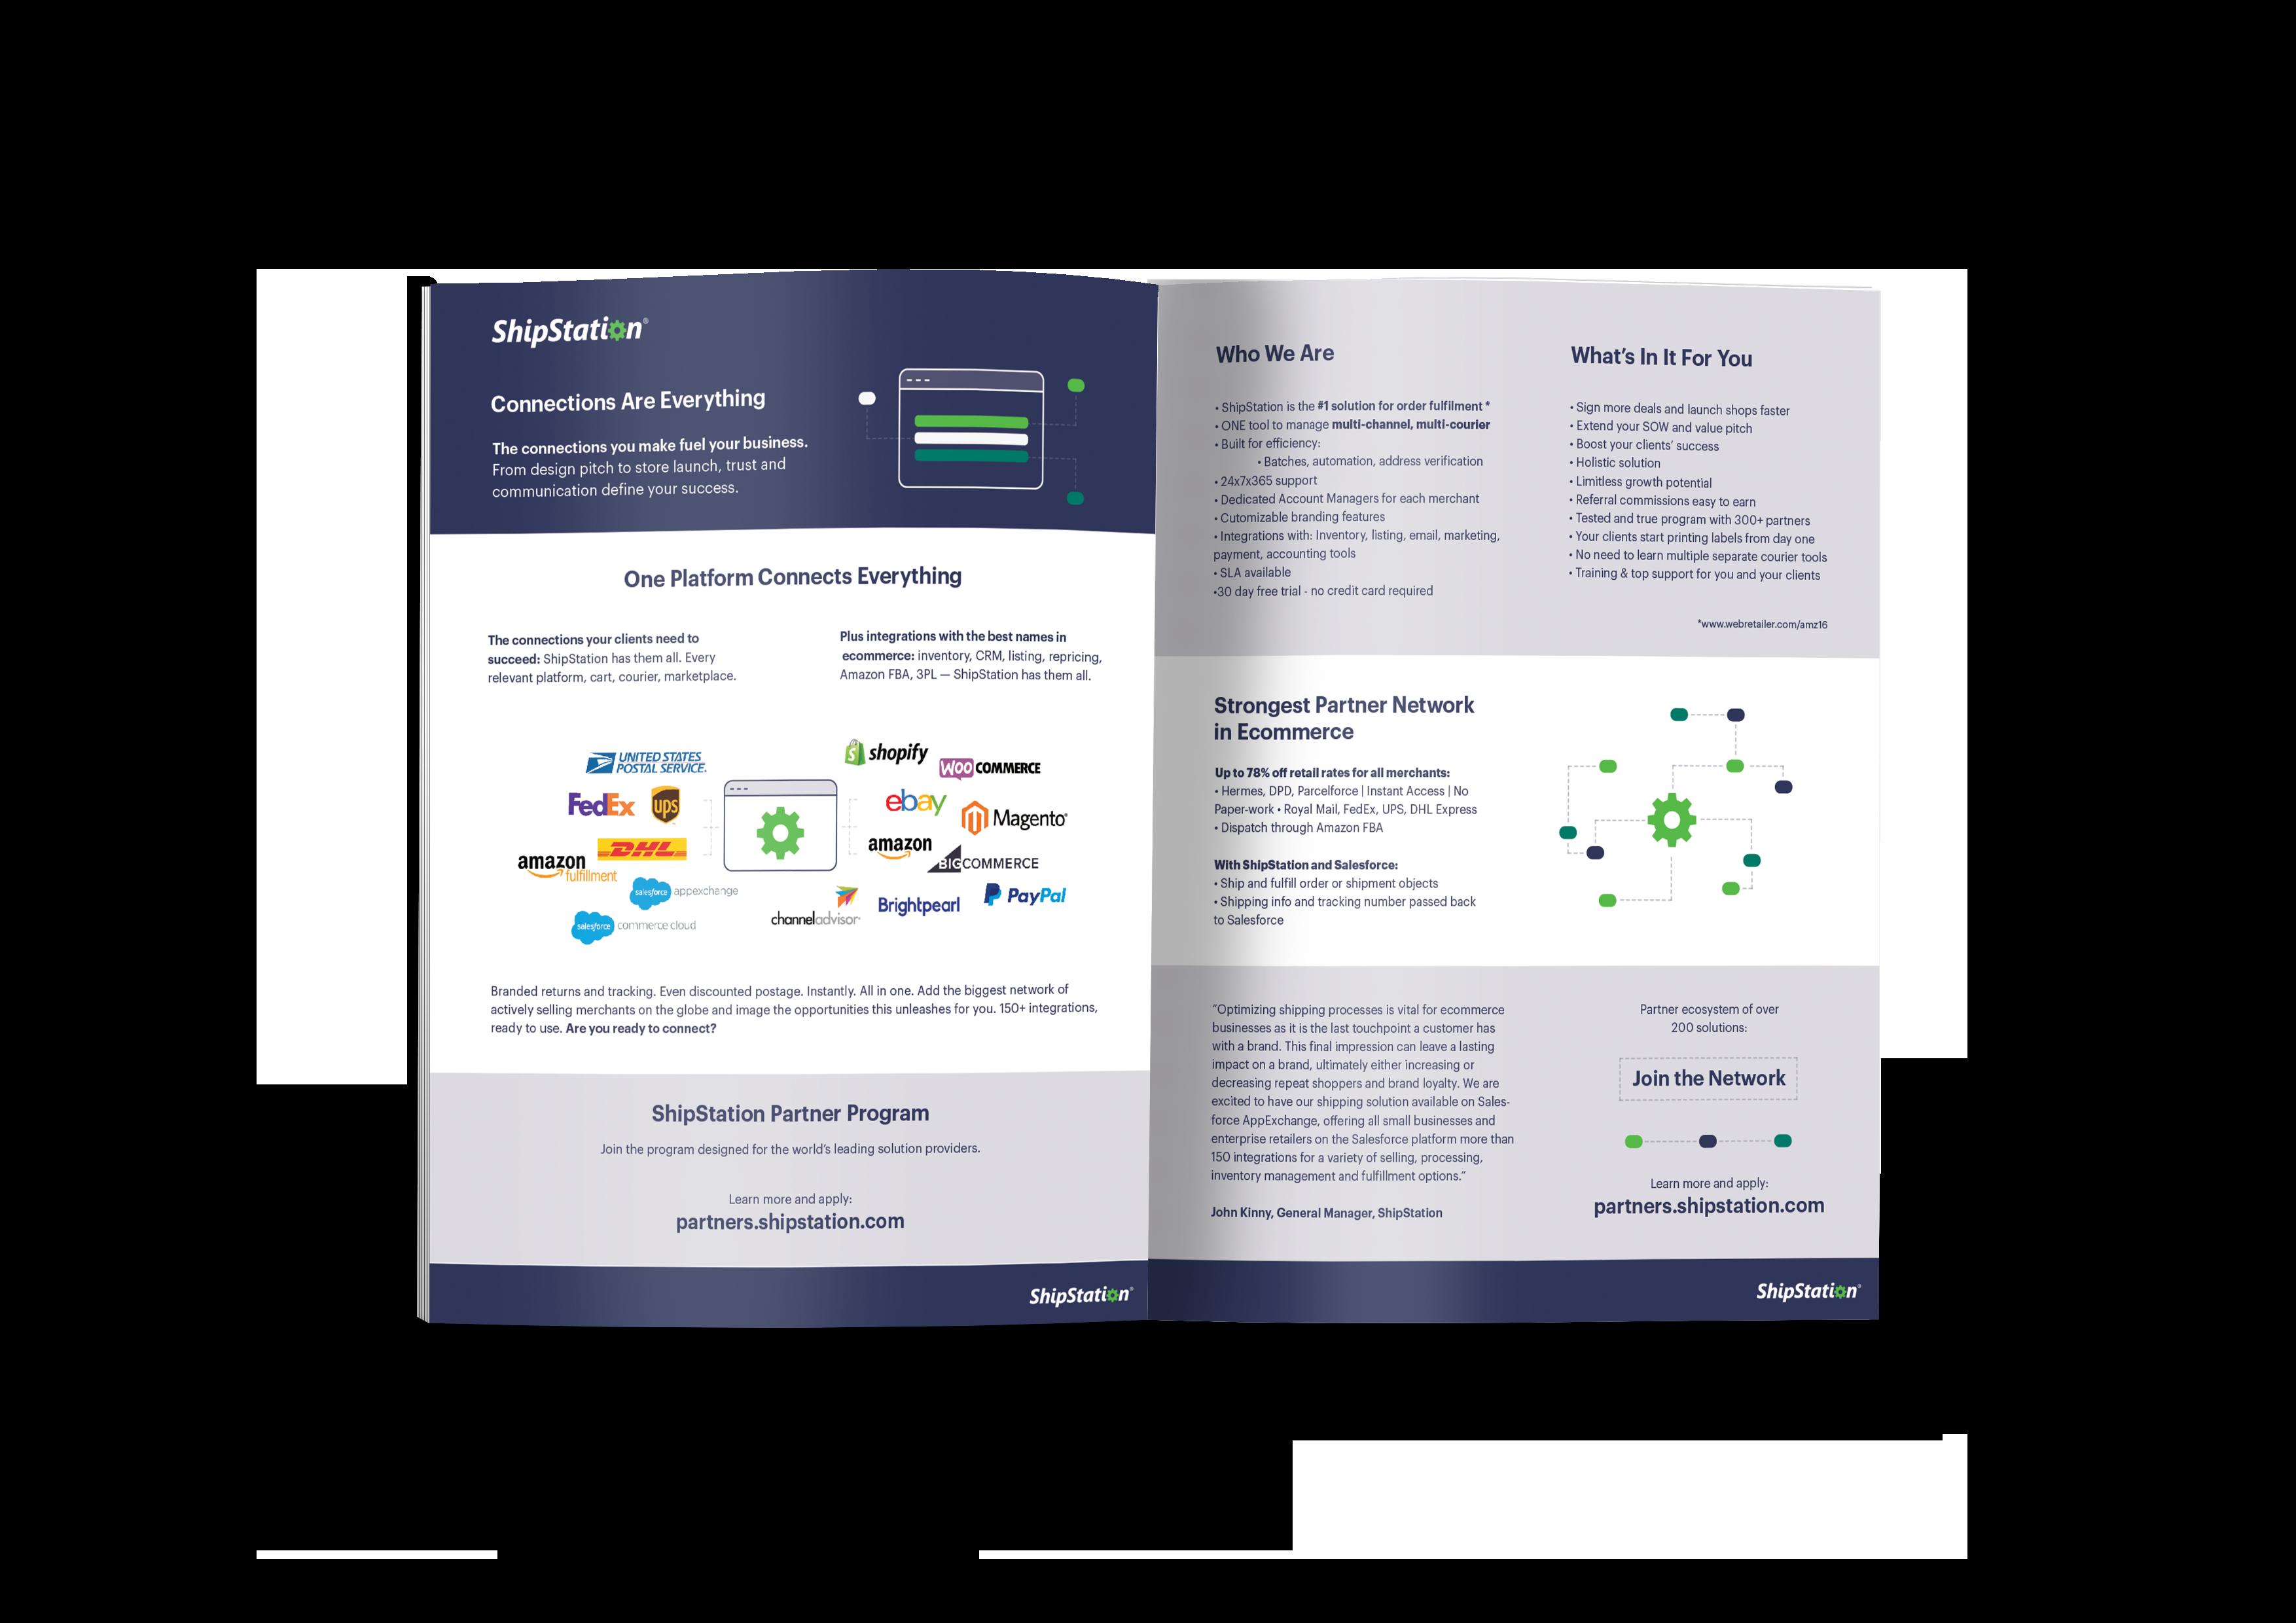 SalesforceFlyer-Mockup